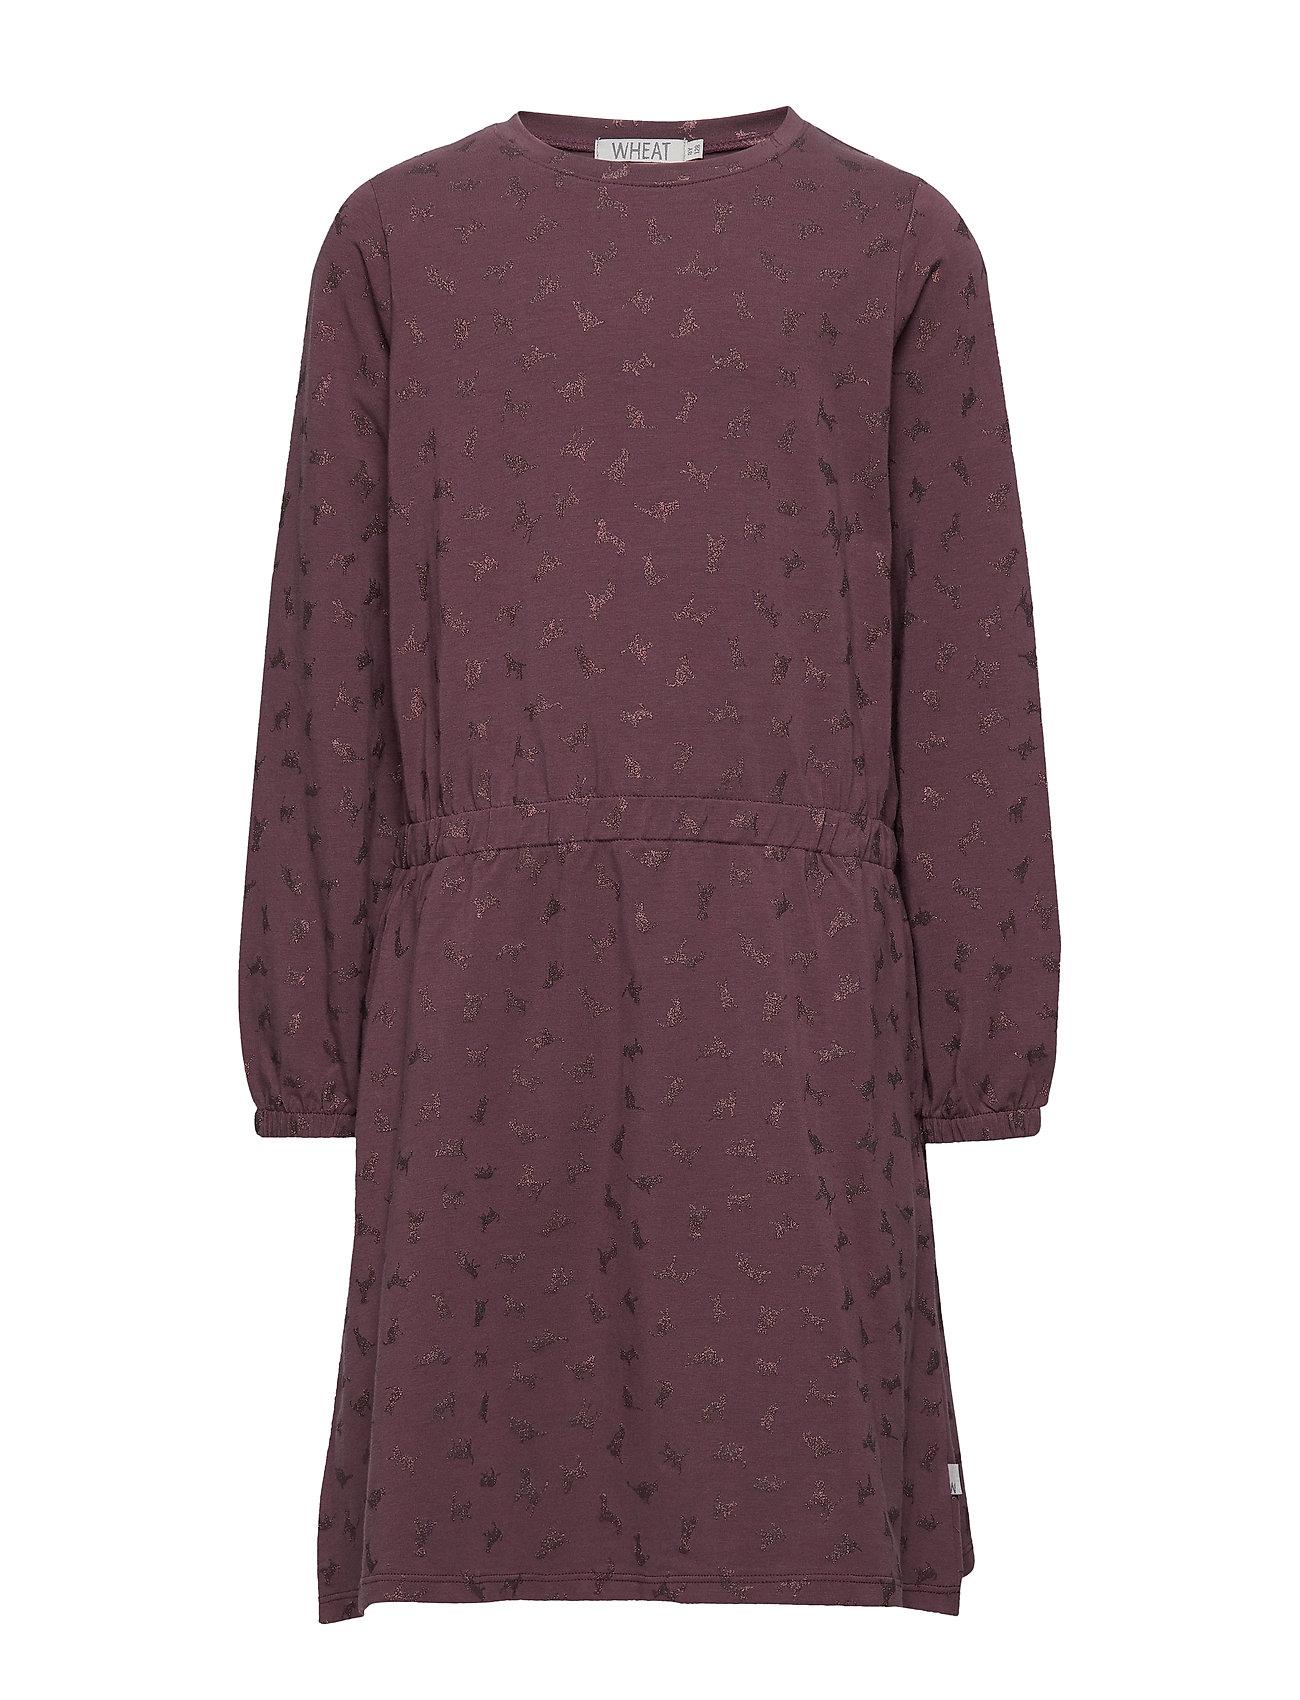 Wheat Dress Henrietta - SOFT EGGPLANT